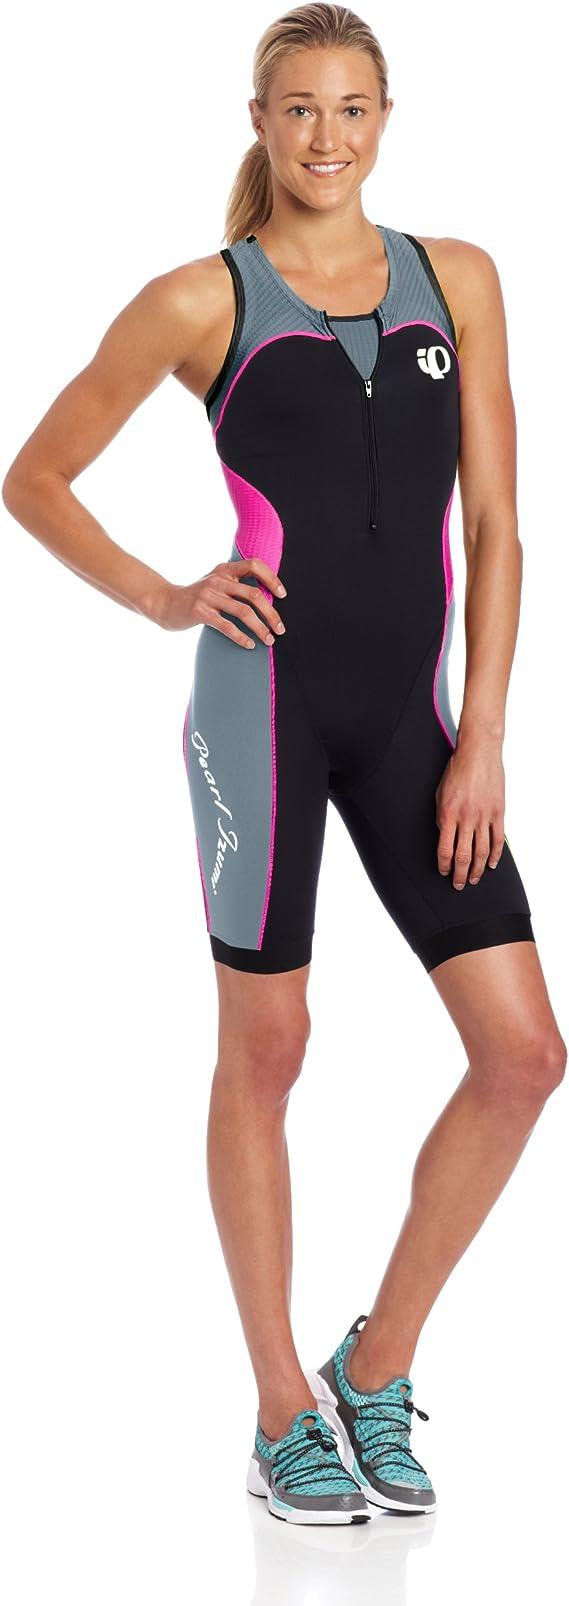 beroy Women Persuit Tri Tank Top,Tristhlon Top Cycling Shorts Jerseys